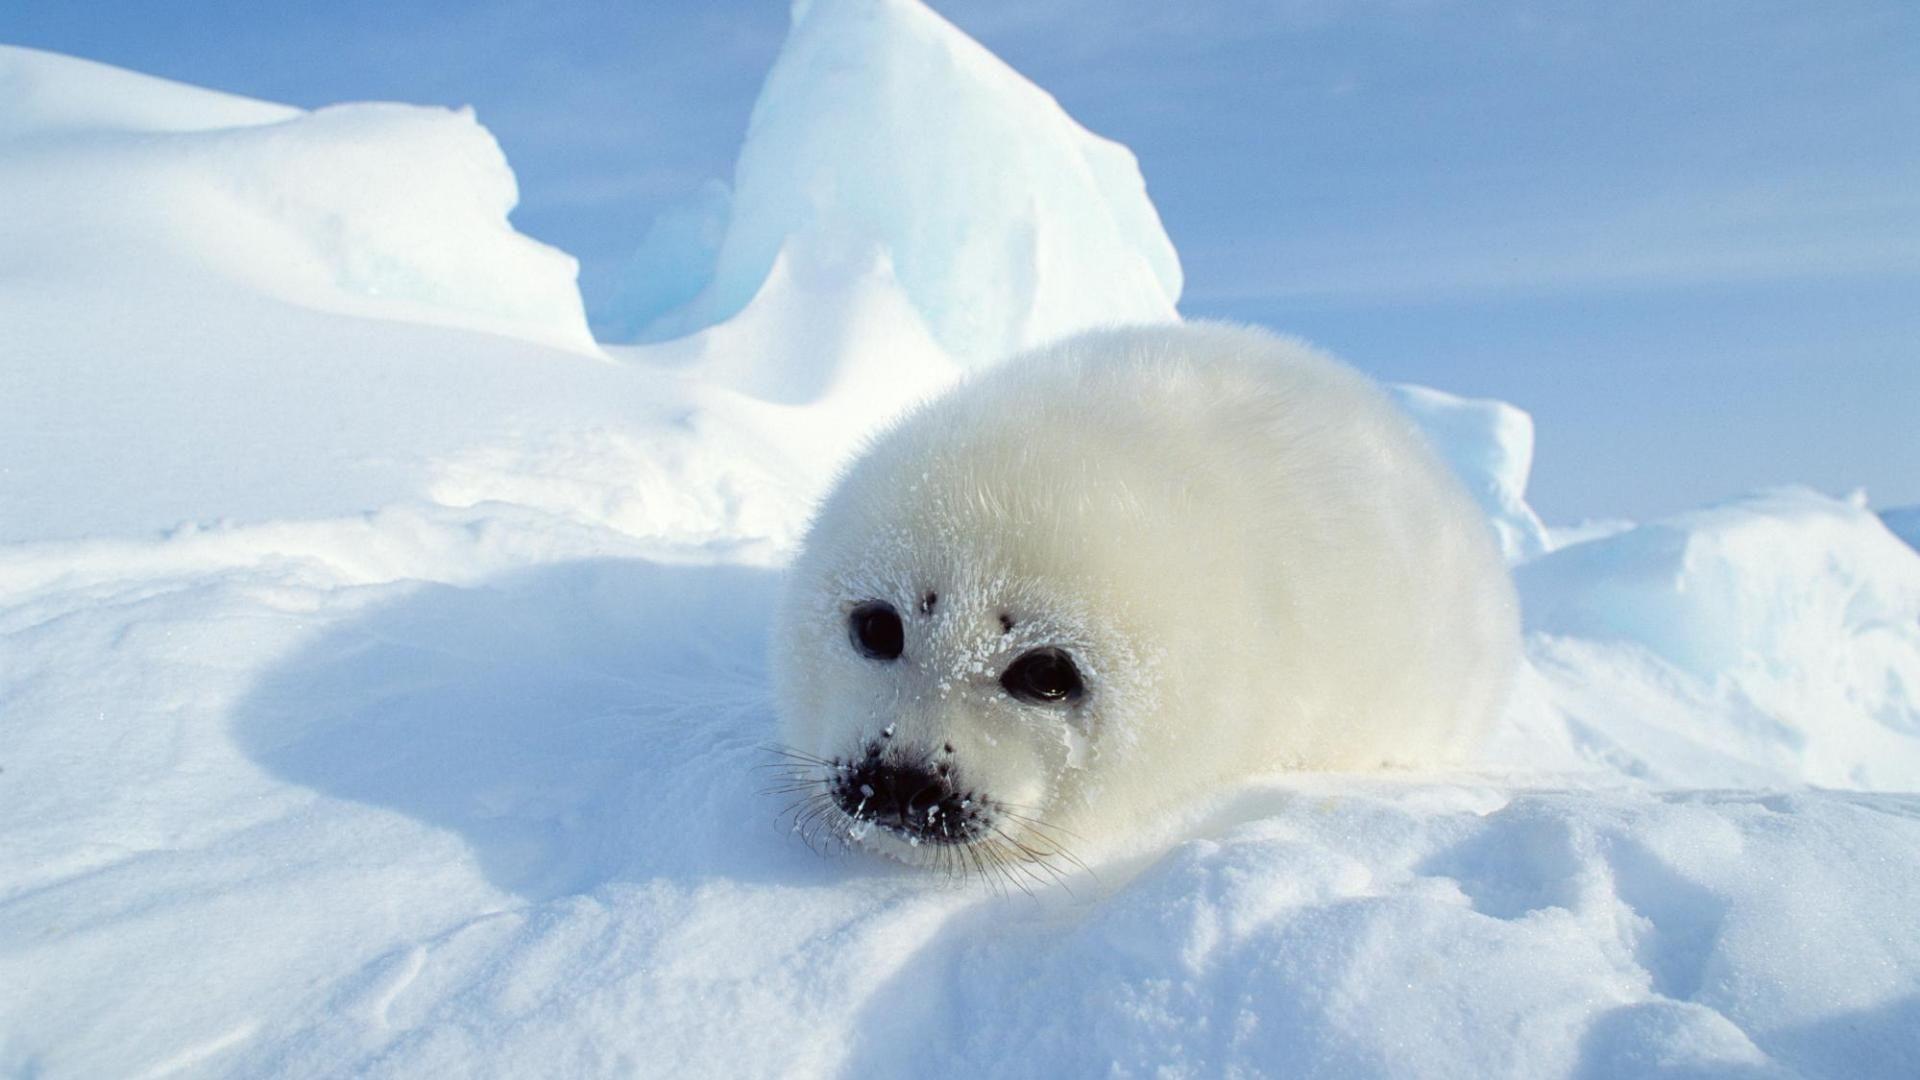 Seal Baby Nature Wild Animals Snow Ice Arctic Hd Wallpaper